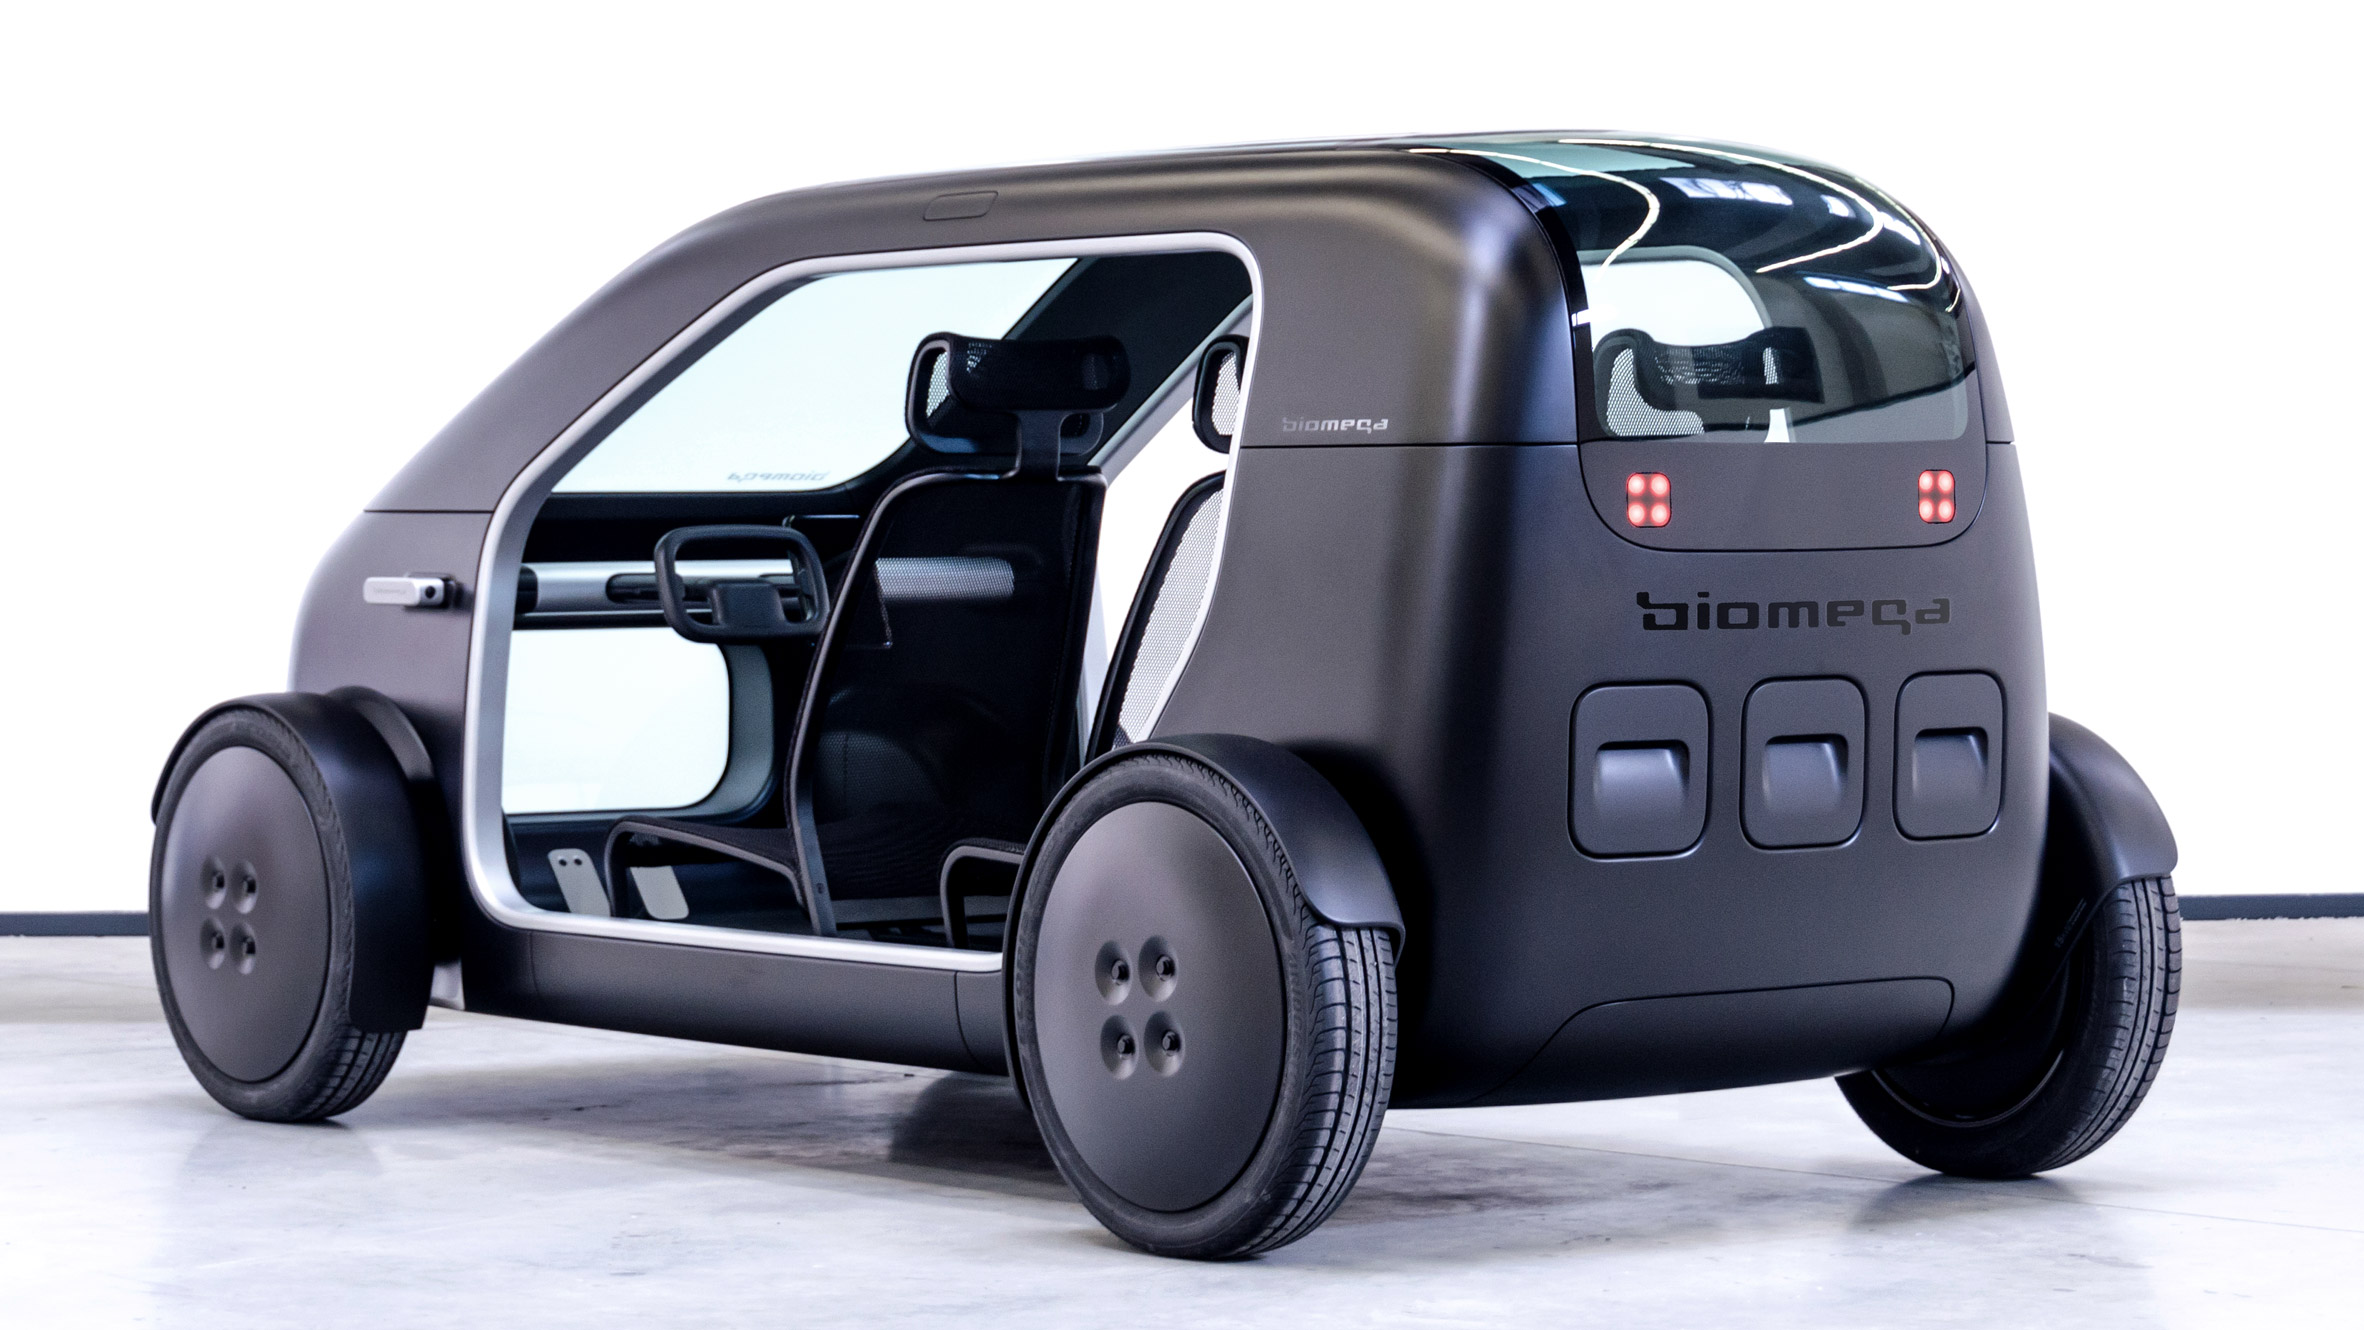 Biomega's electric car concept